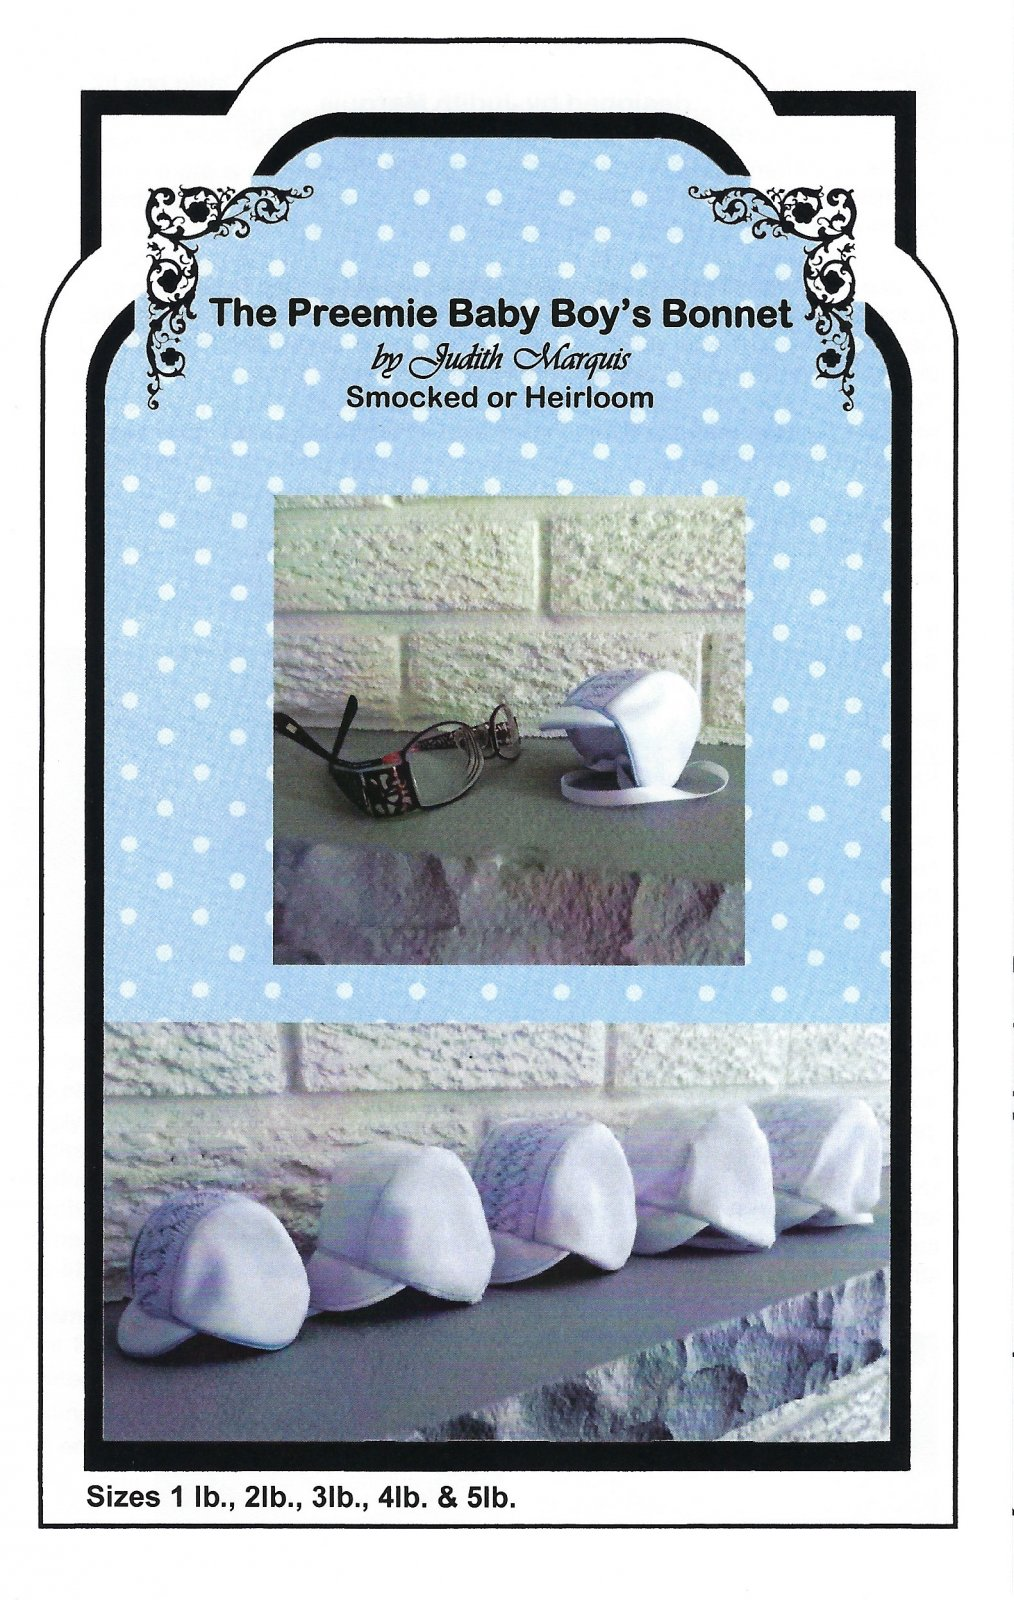 Judith Marquis - The Preemie Baby Boy's Bonnet